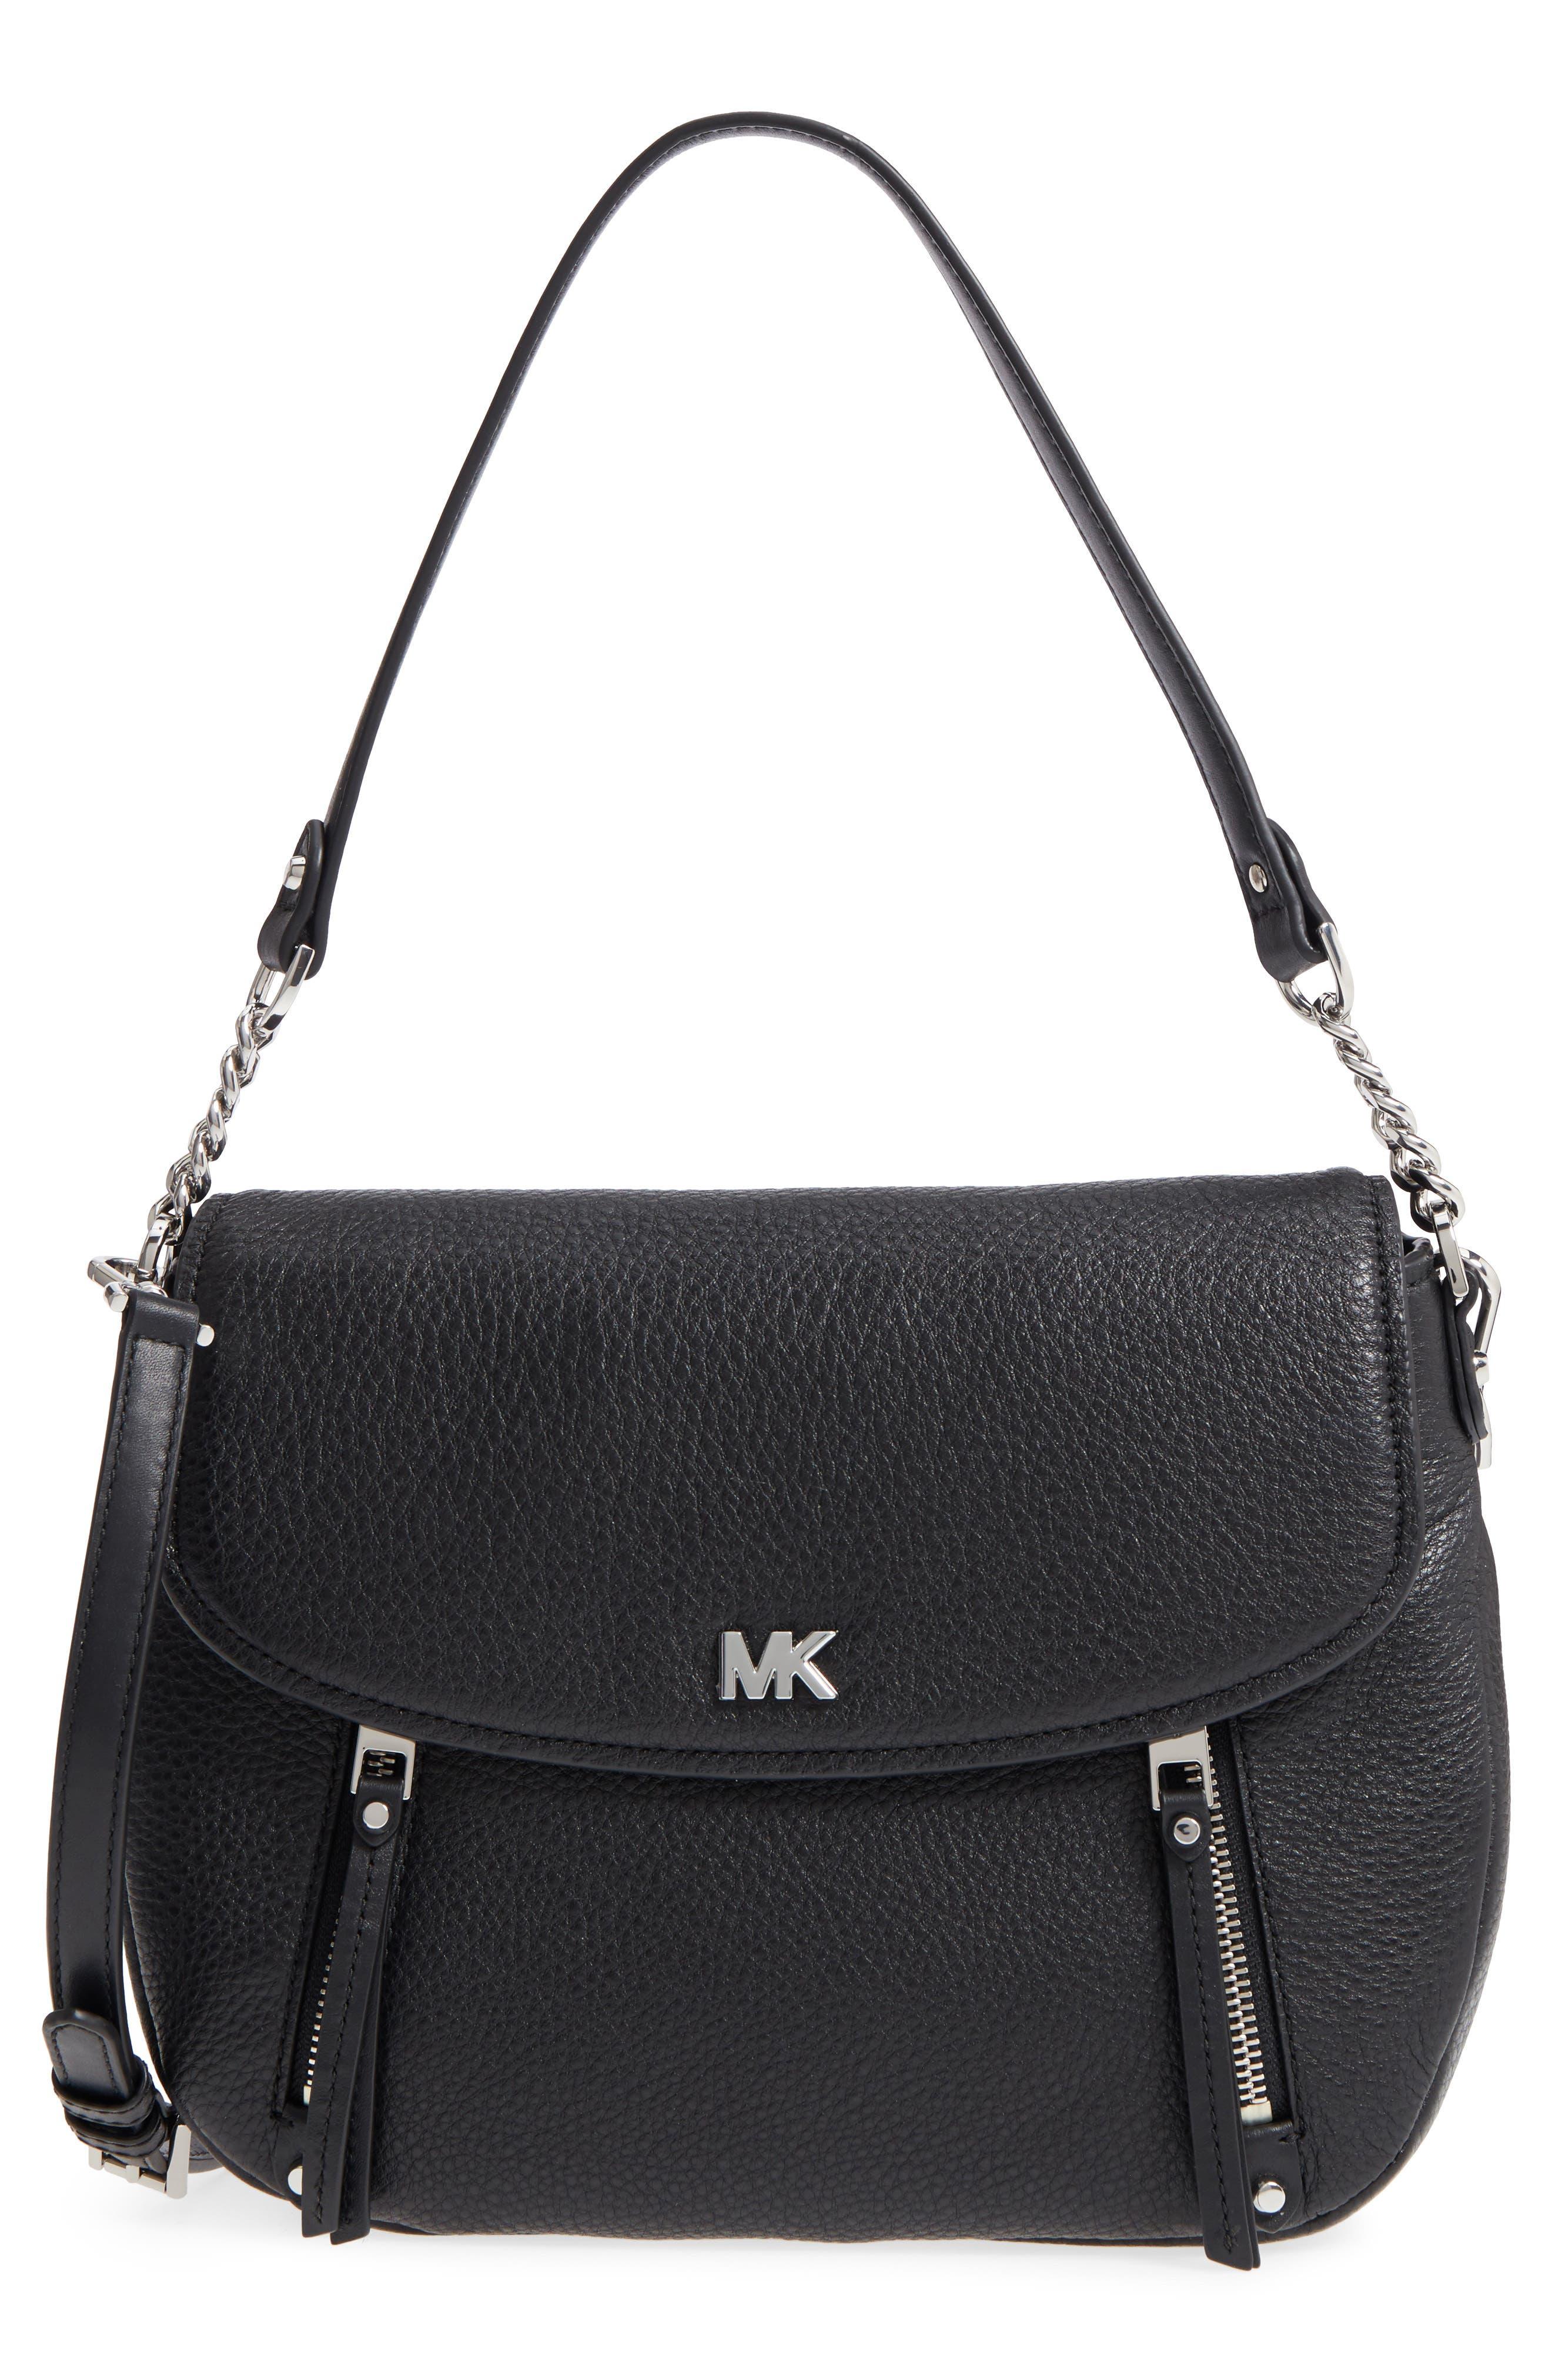 Medium Leather Shoulder Bag,                             Main thumbnail 1, color,                             Black